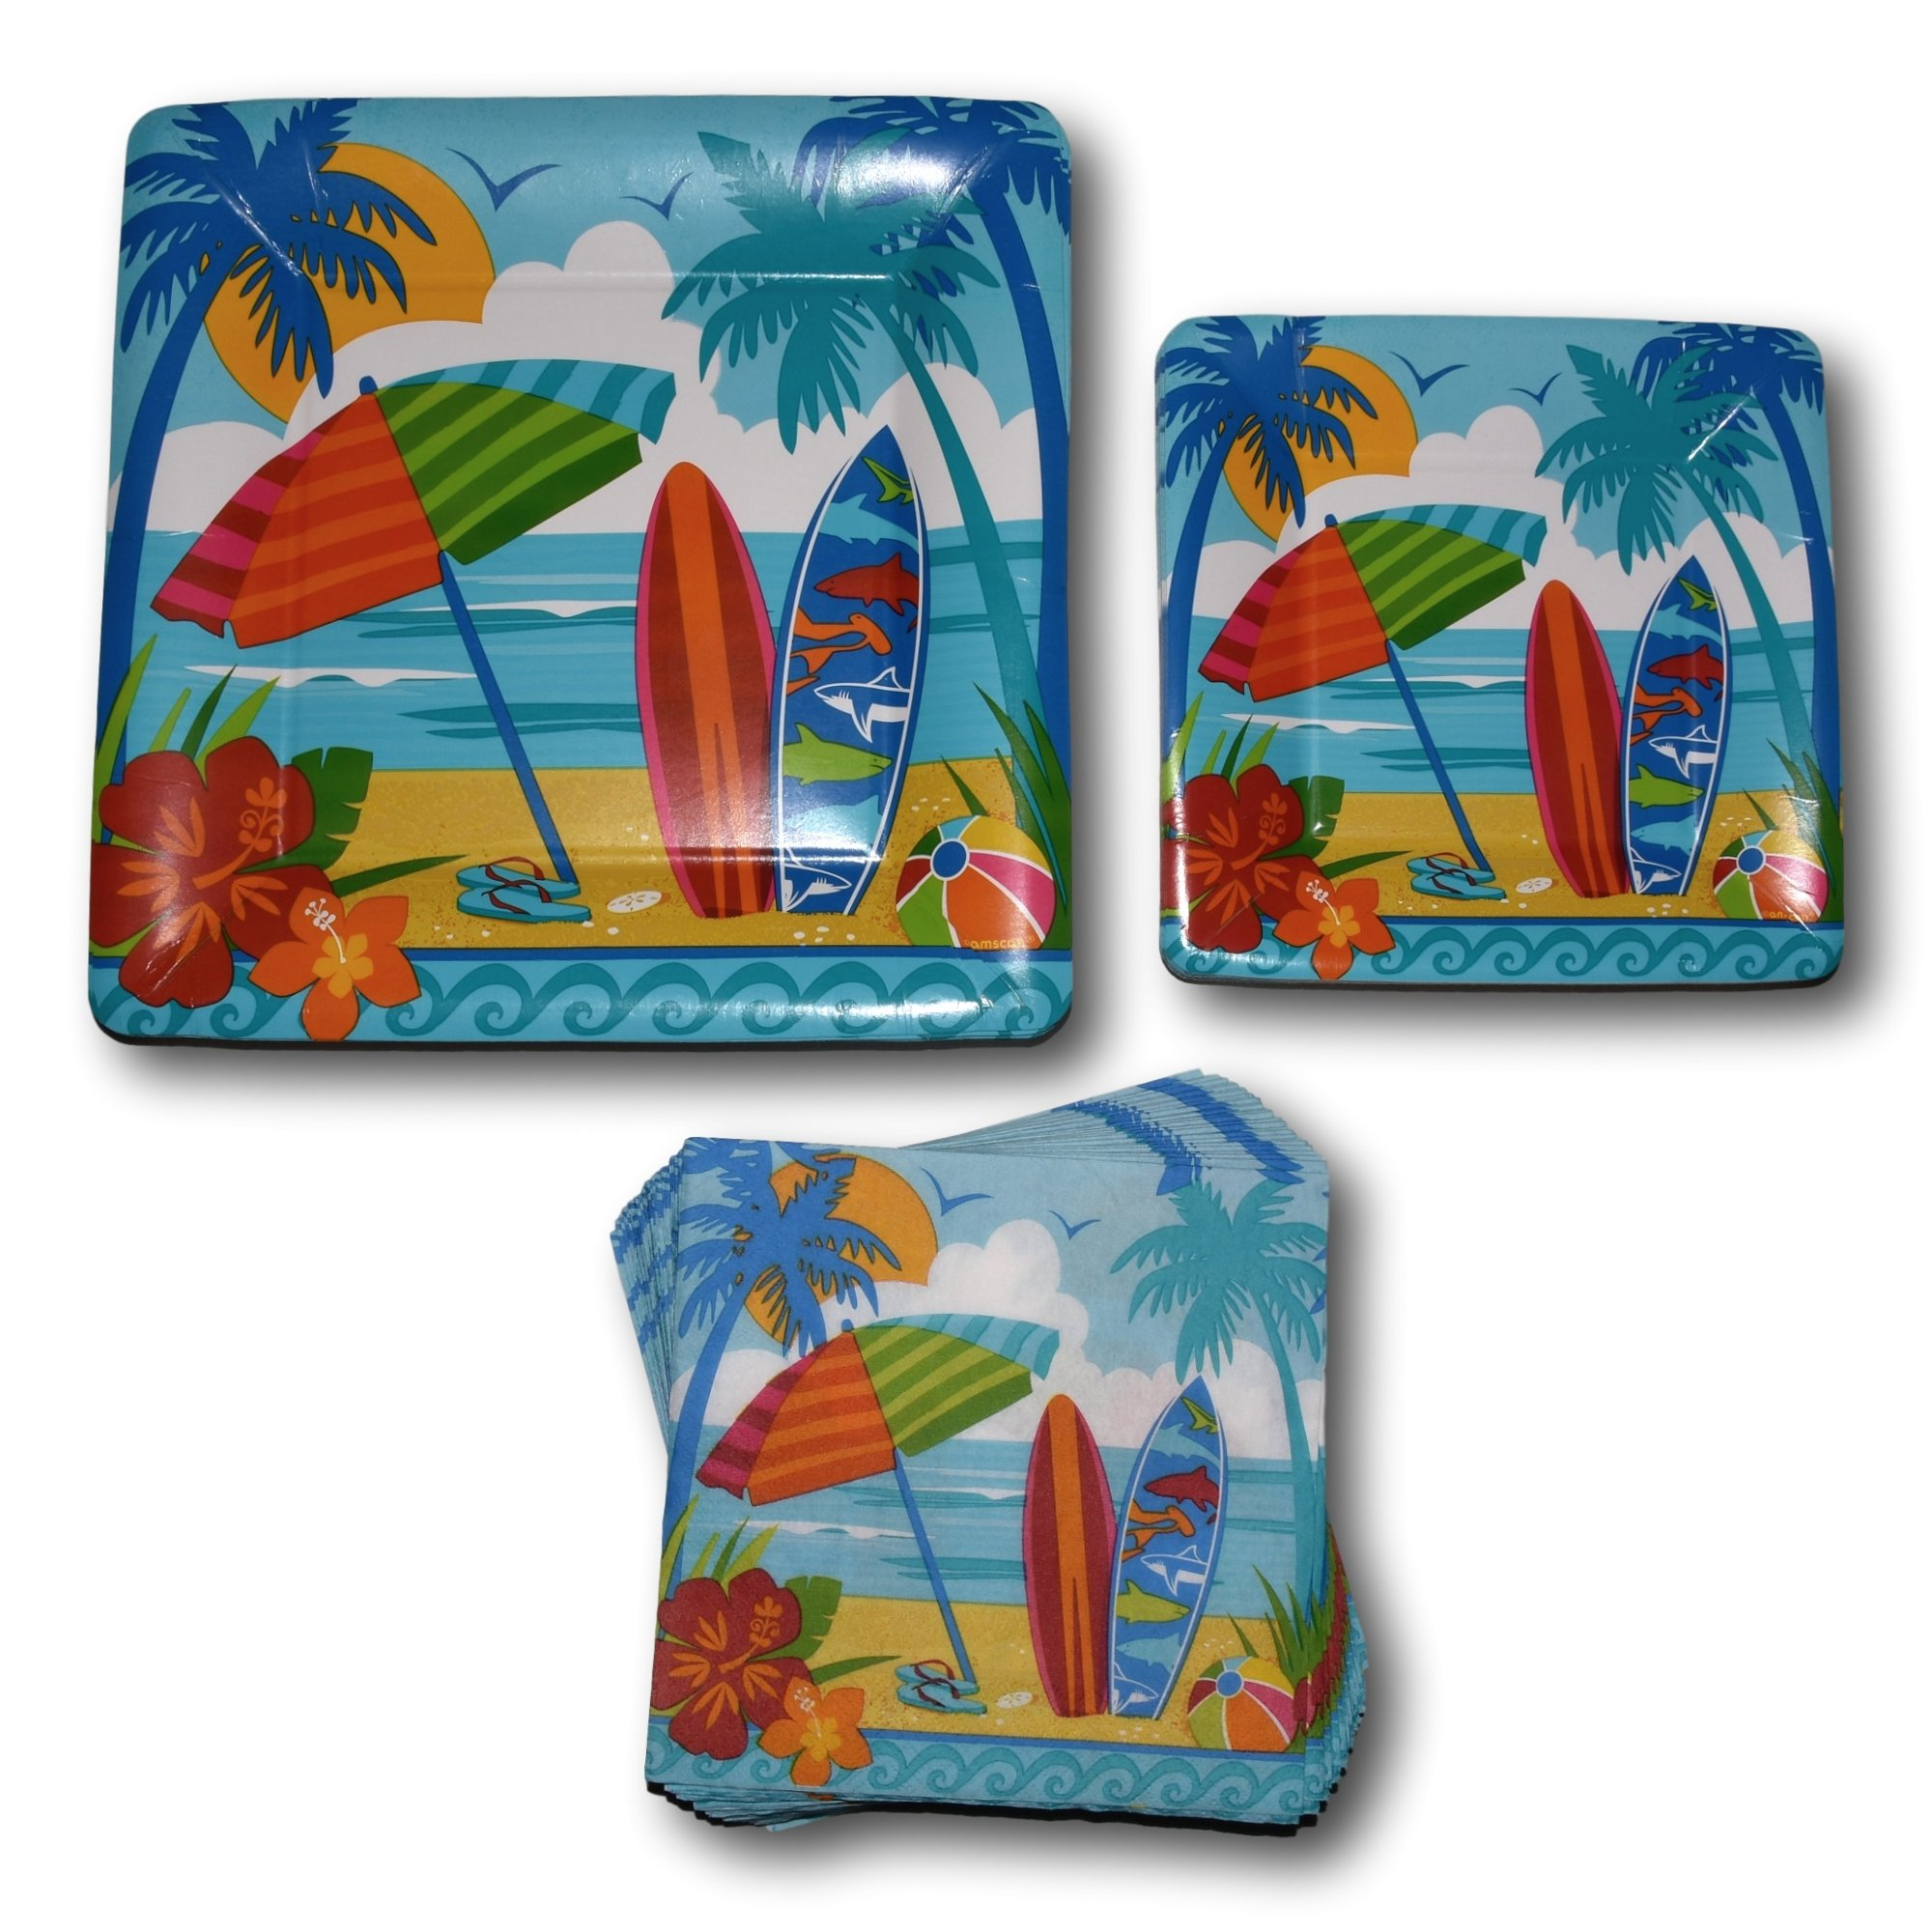 Combined Brands Summer Surfboard Beach Hawaiian Tropical Luau Paper Plates Napkins Party Supply Bundle - Picnic Tableware Set Includes - Beach Dinner Plates - Dessert Plates Napkins